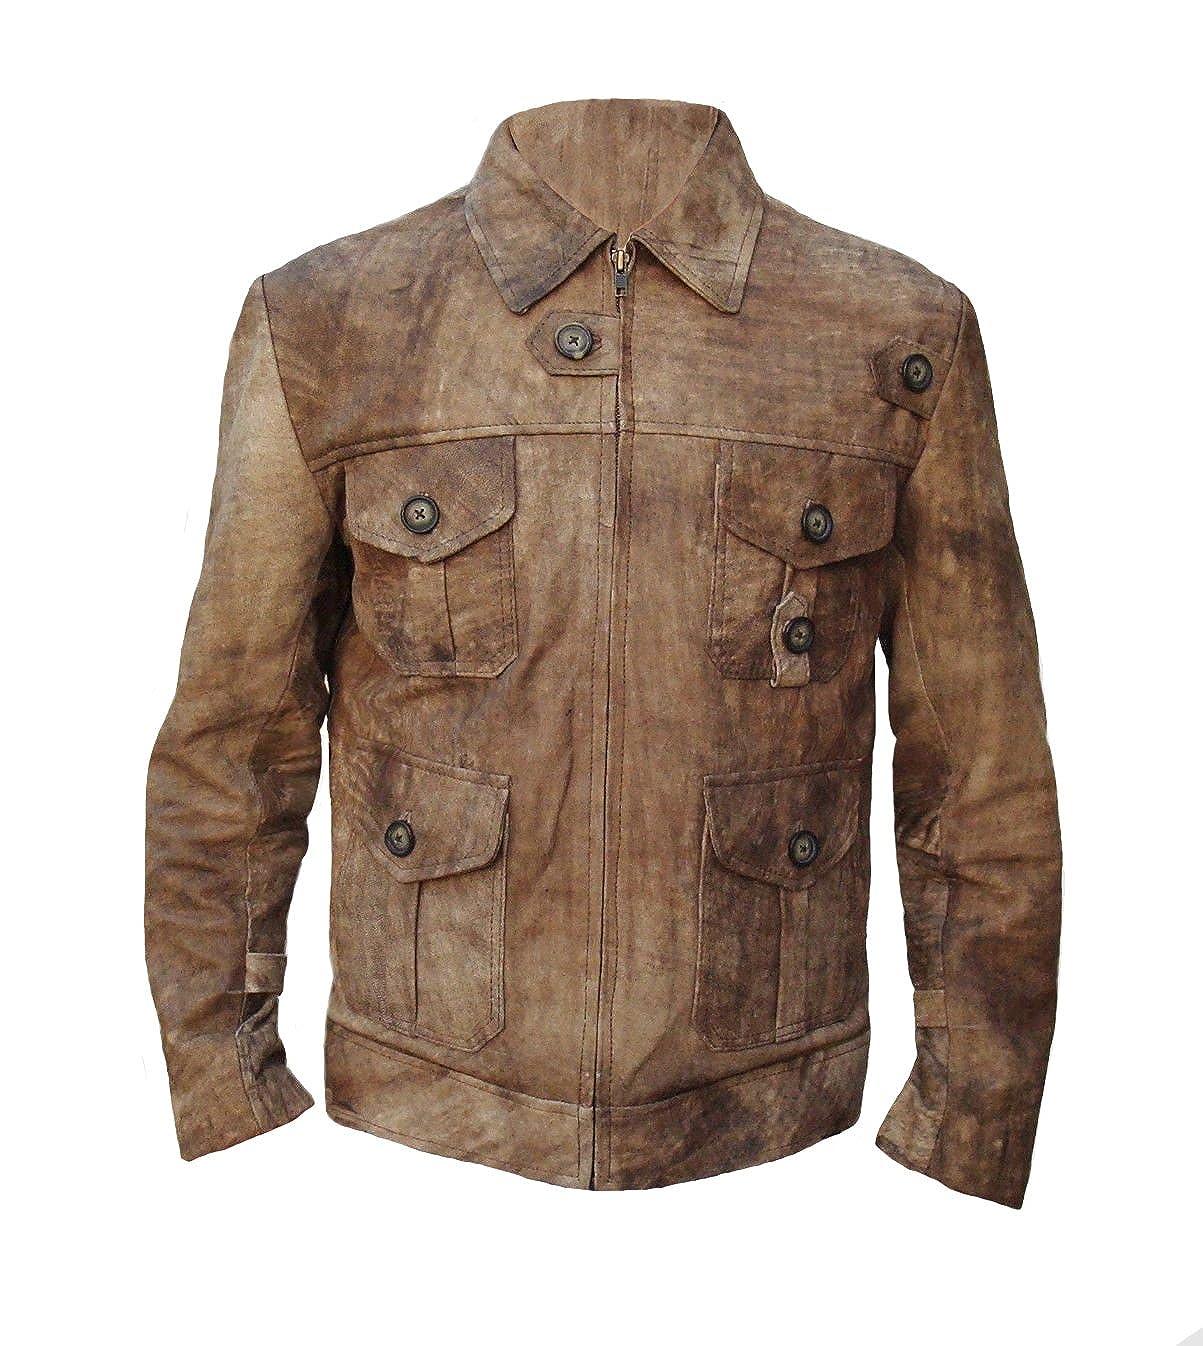 f35fa8456 FaddyRox The Expendables 2 Jason Statham Distressed Leather Jacket ...